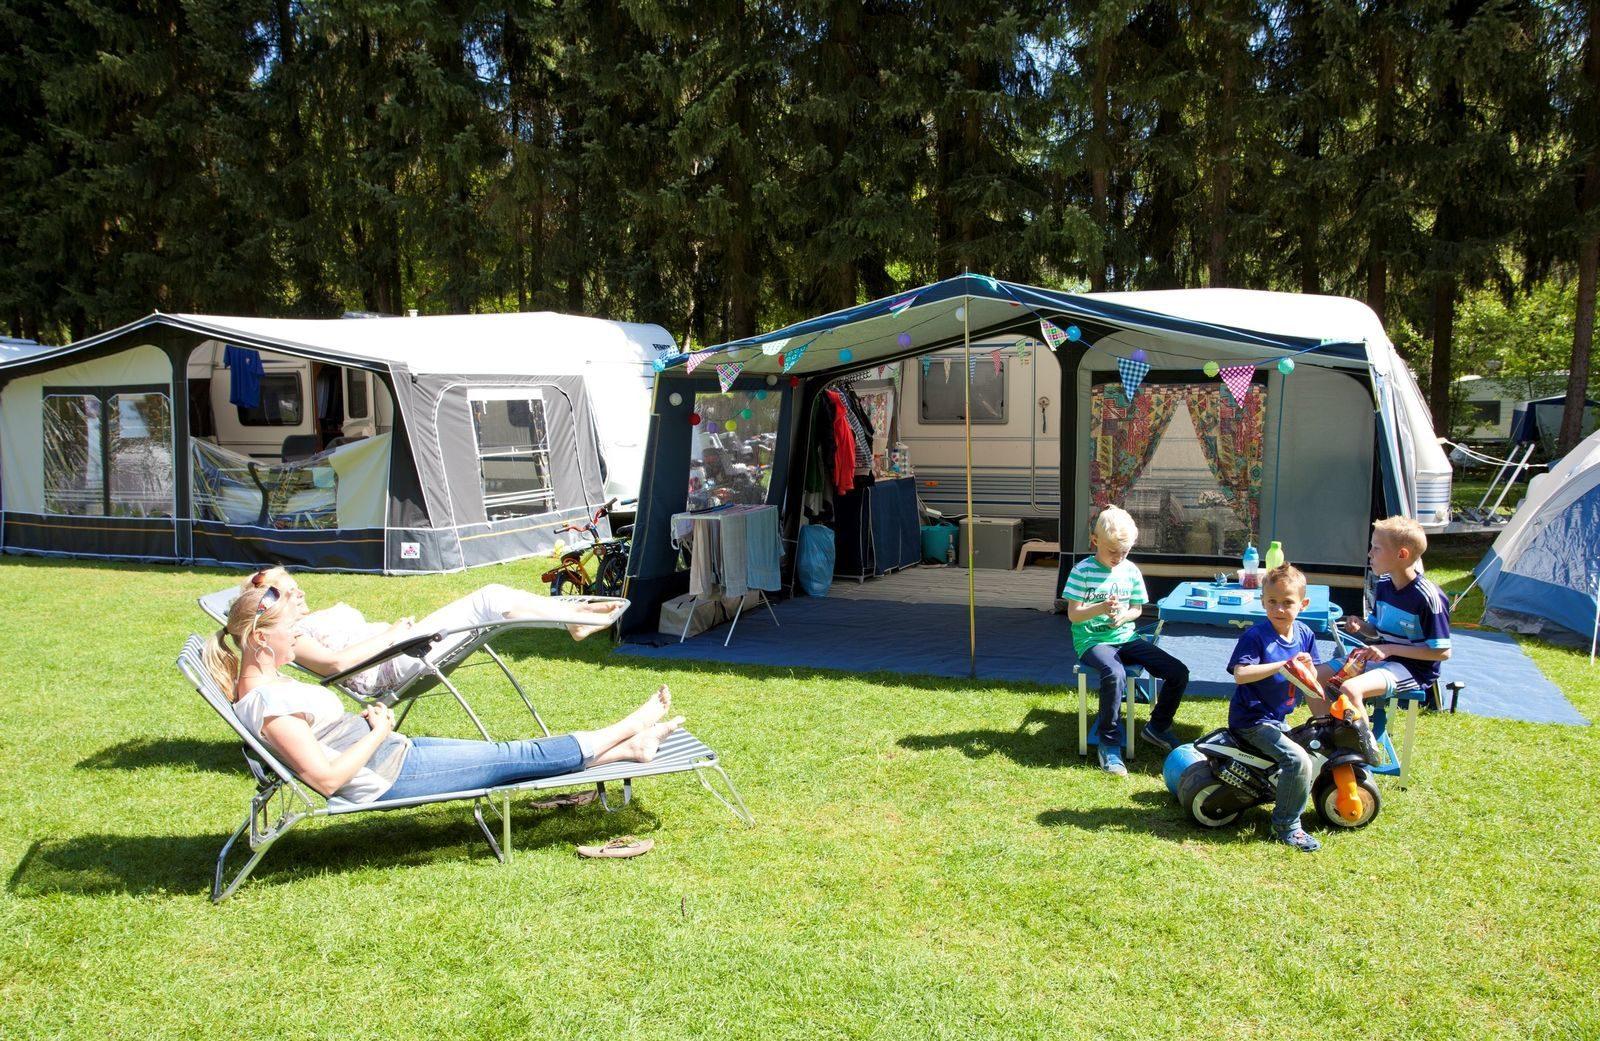 Camping September